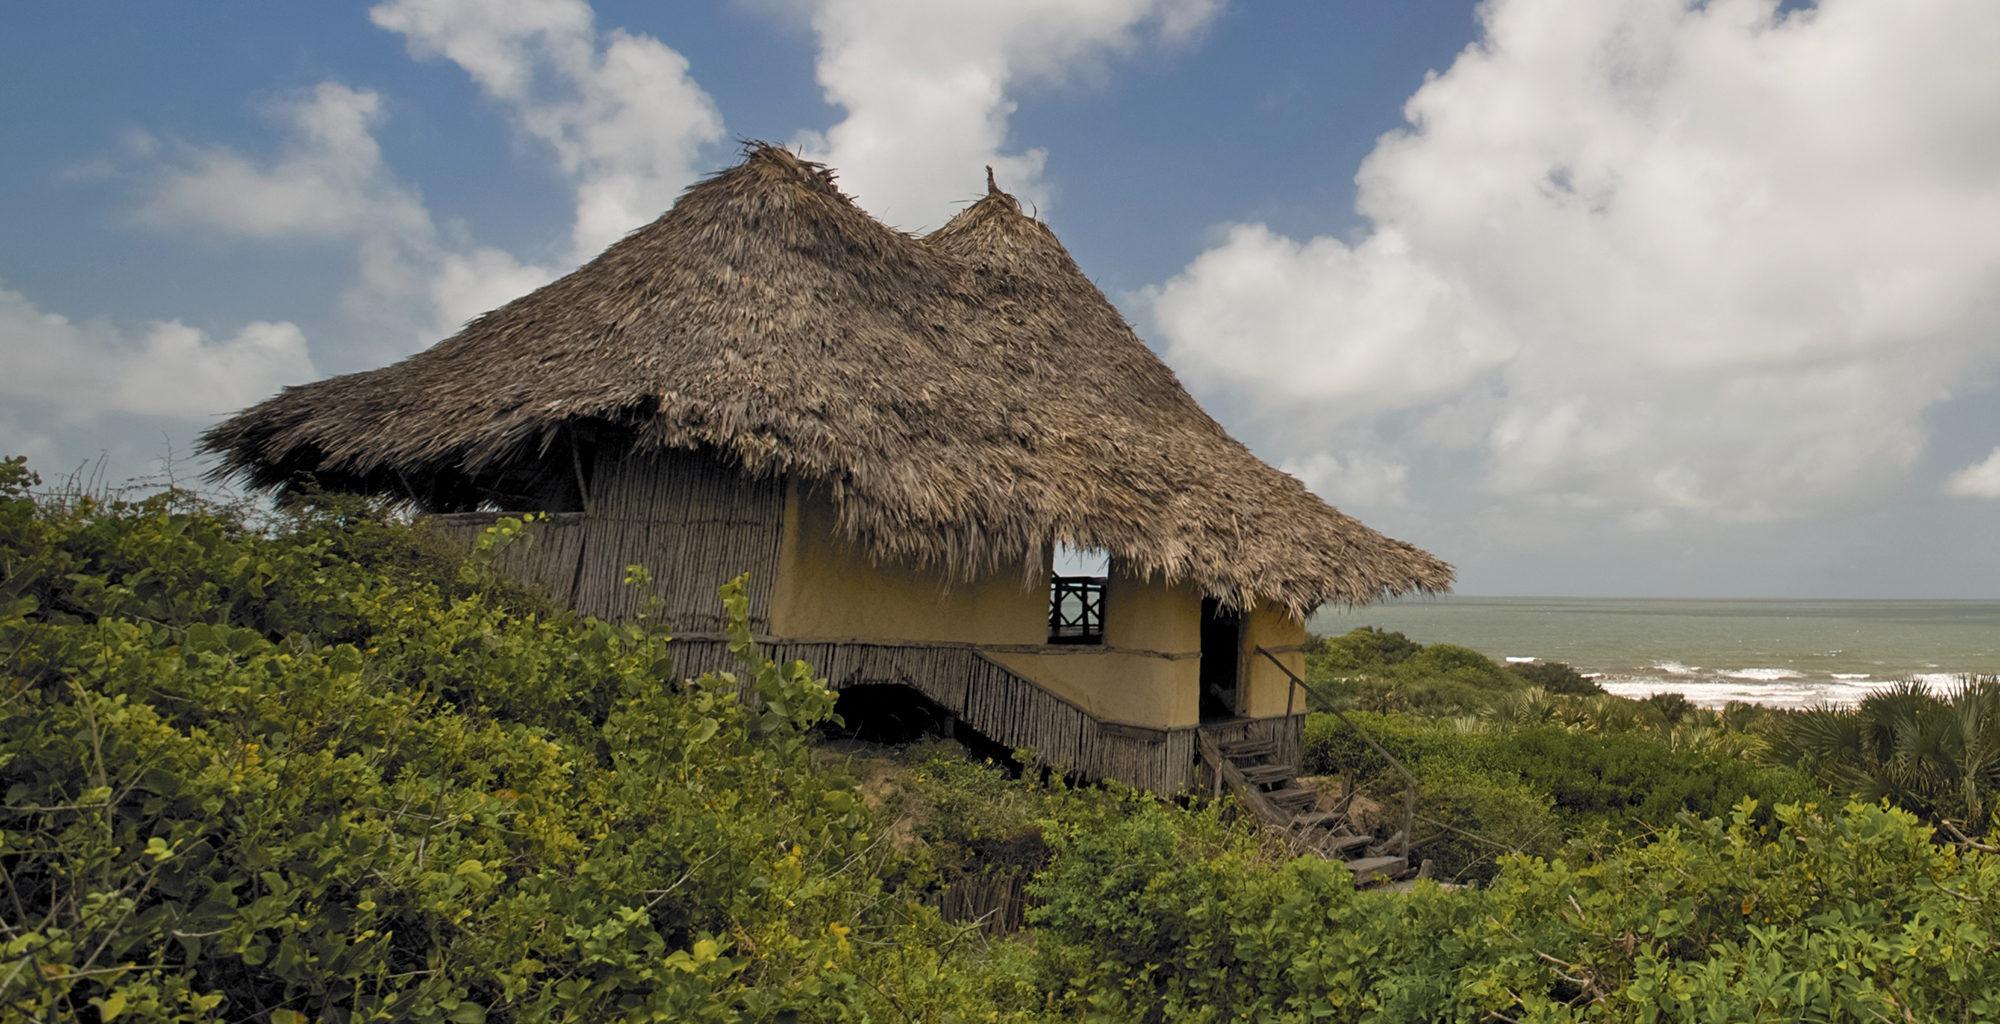 Kenya-Tana-Delta-Camp-Exterior